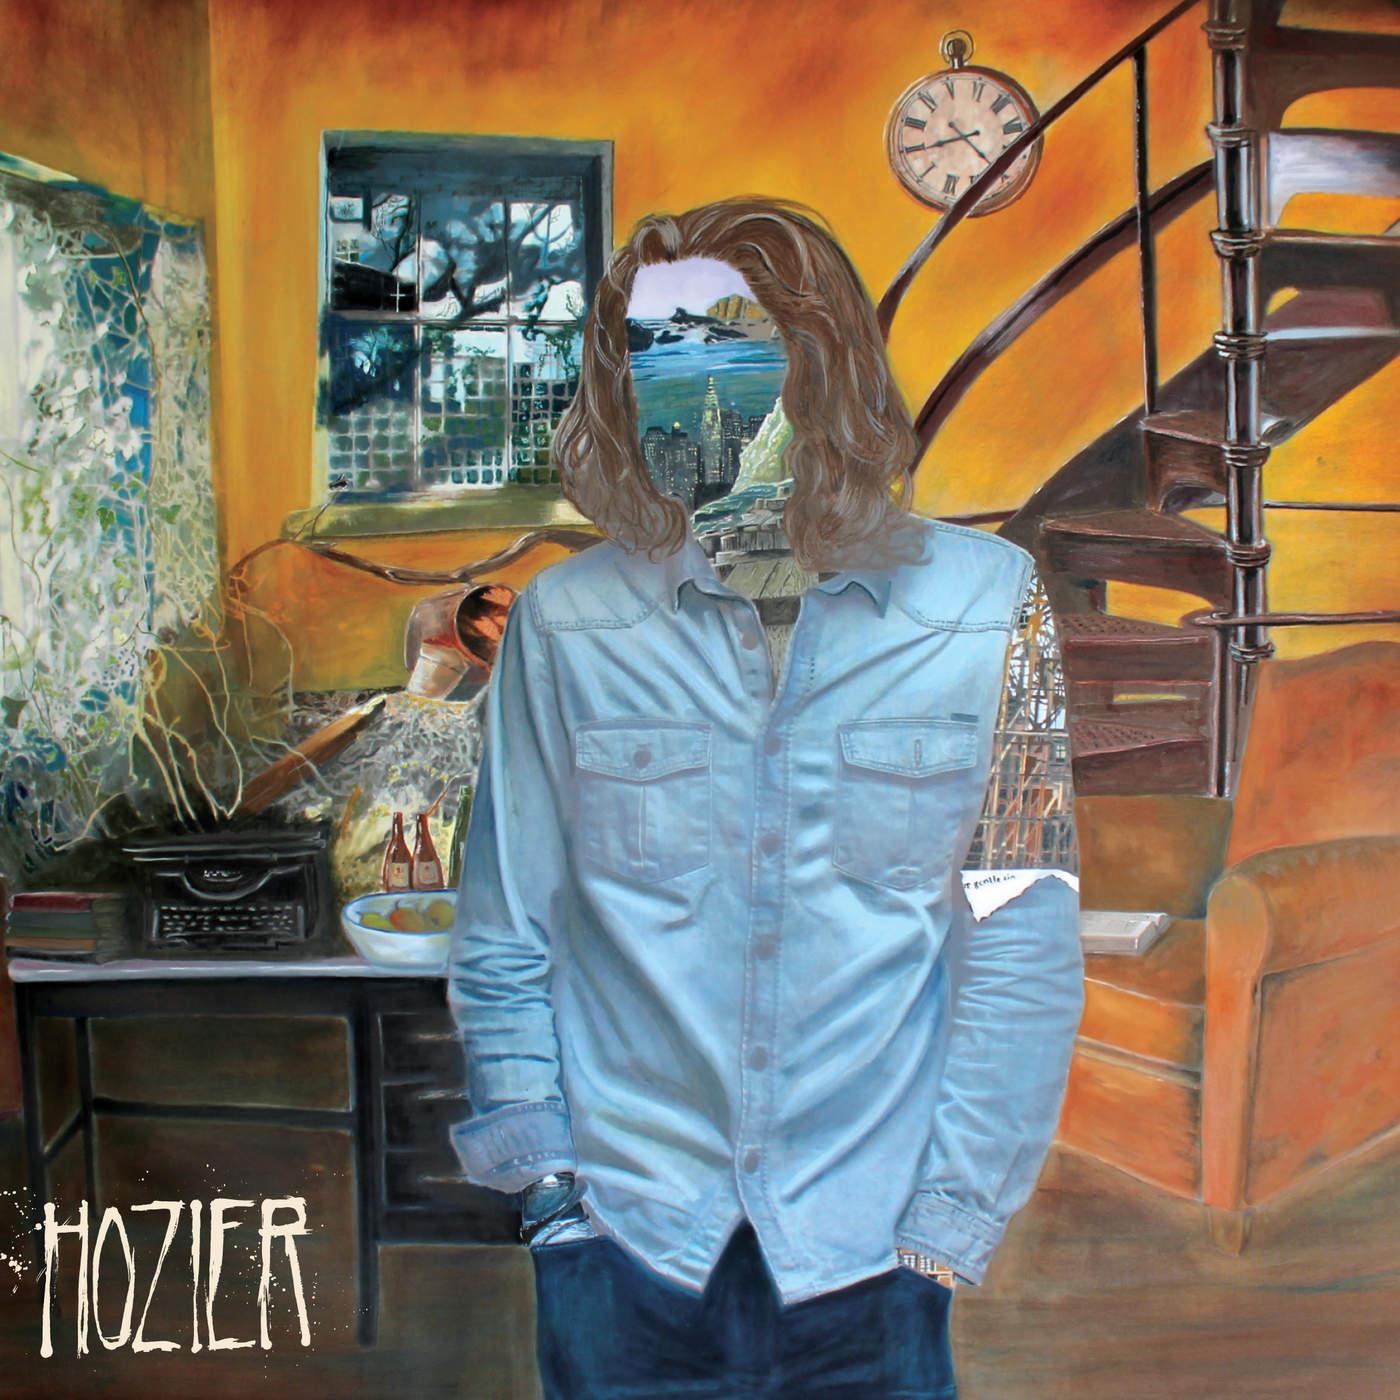 Hozier (iTunes Festival Deluxe Edition) (CD3) - Hozier